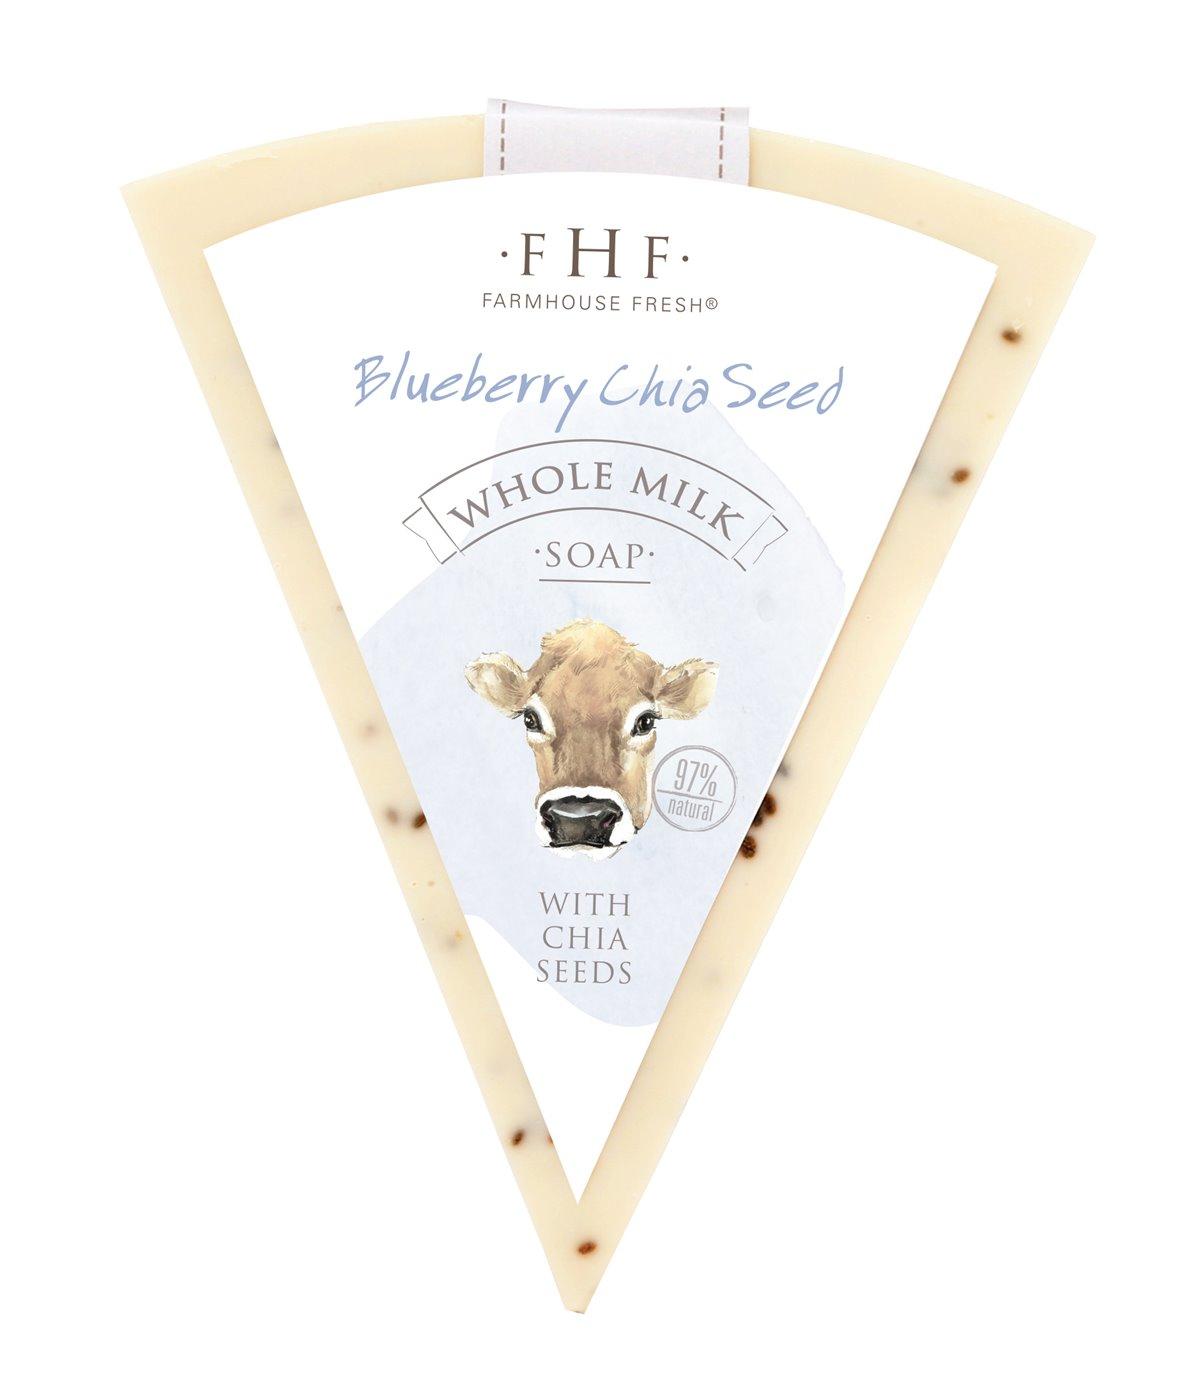 Farmhouse Fresh Blueberry Chia Seed Whole Milk Bar Soap